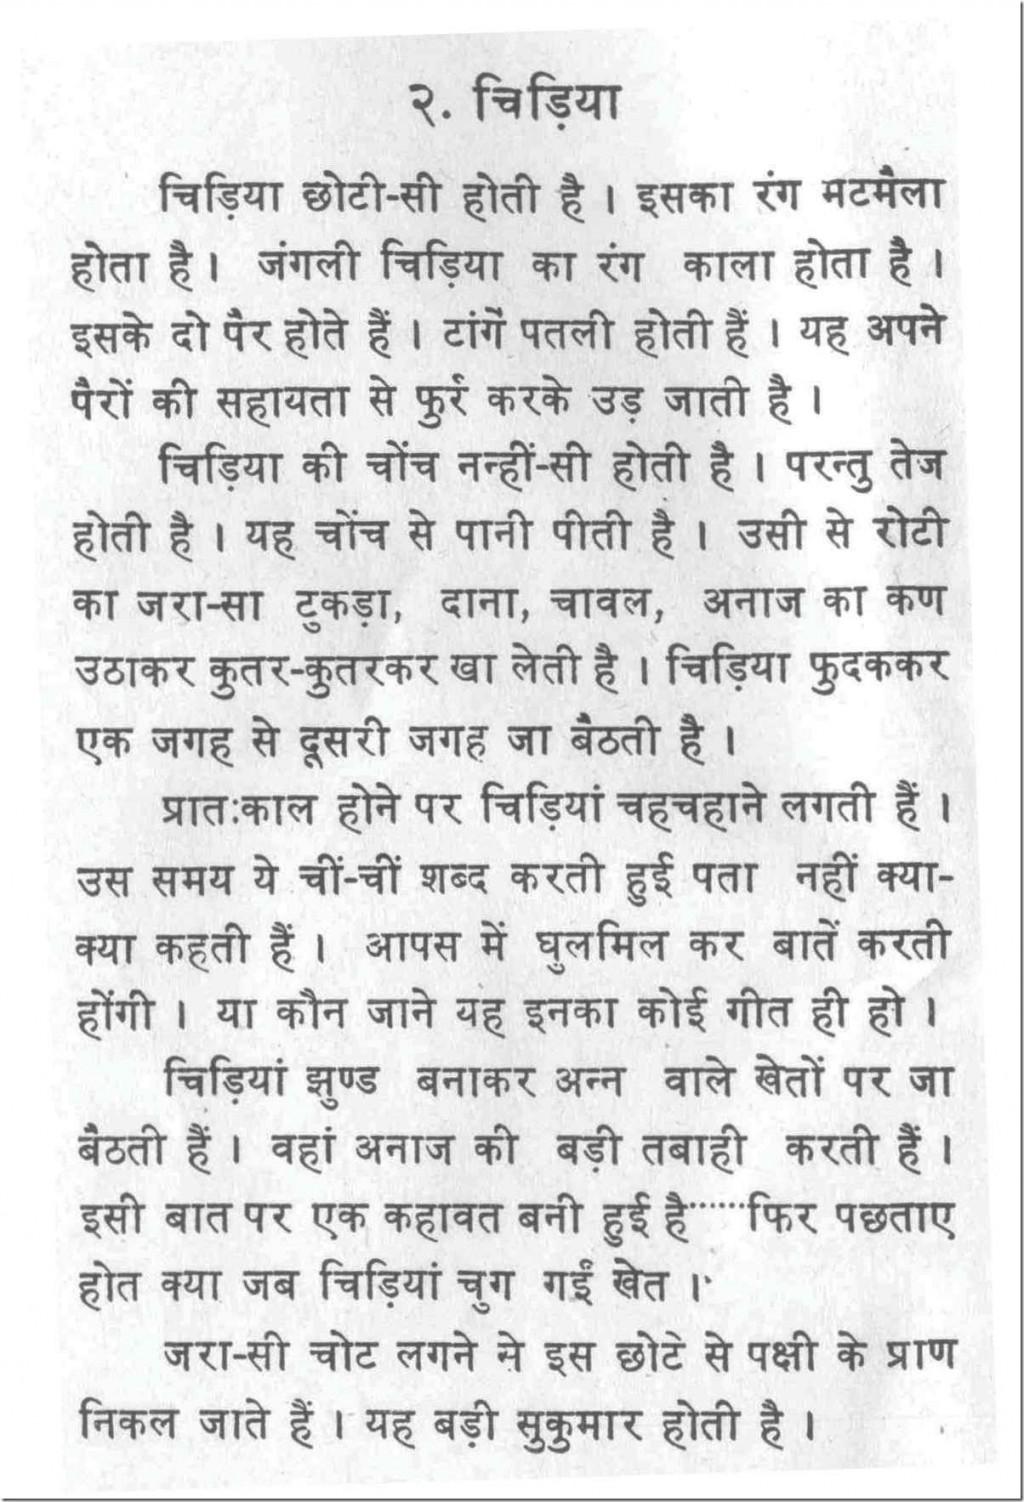 008 Essay Example Save Water Wikipedia How Thumb Small On Earth In English Hindi Marathi Awful Life Tamil Gujarati Large